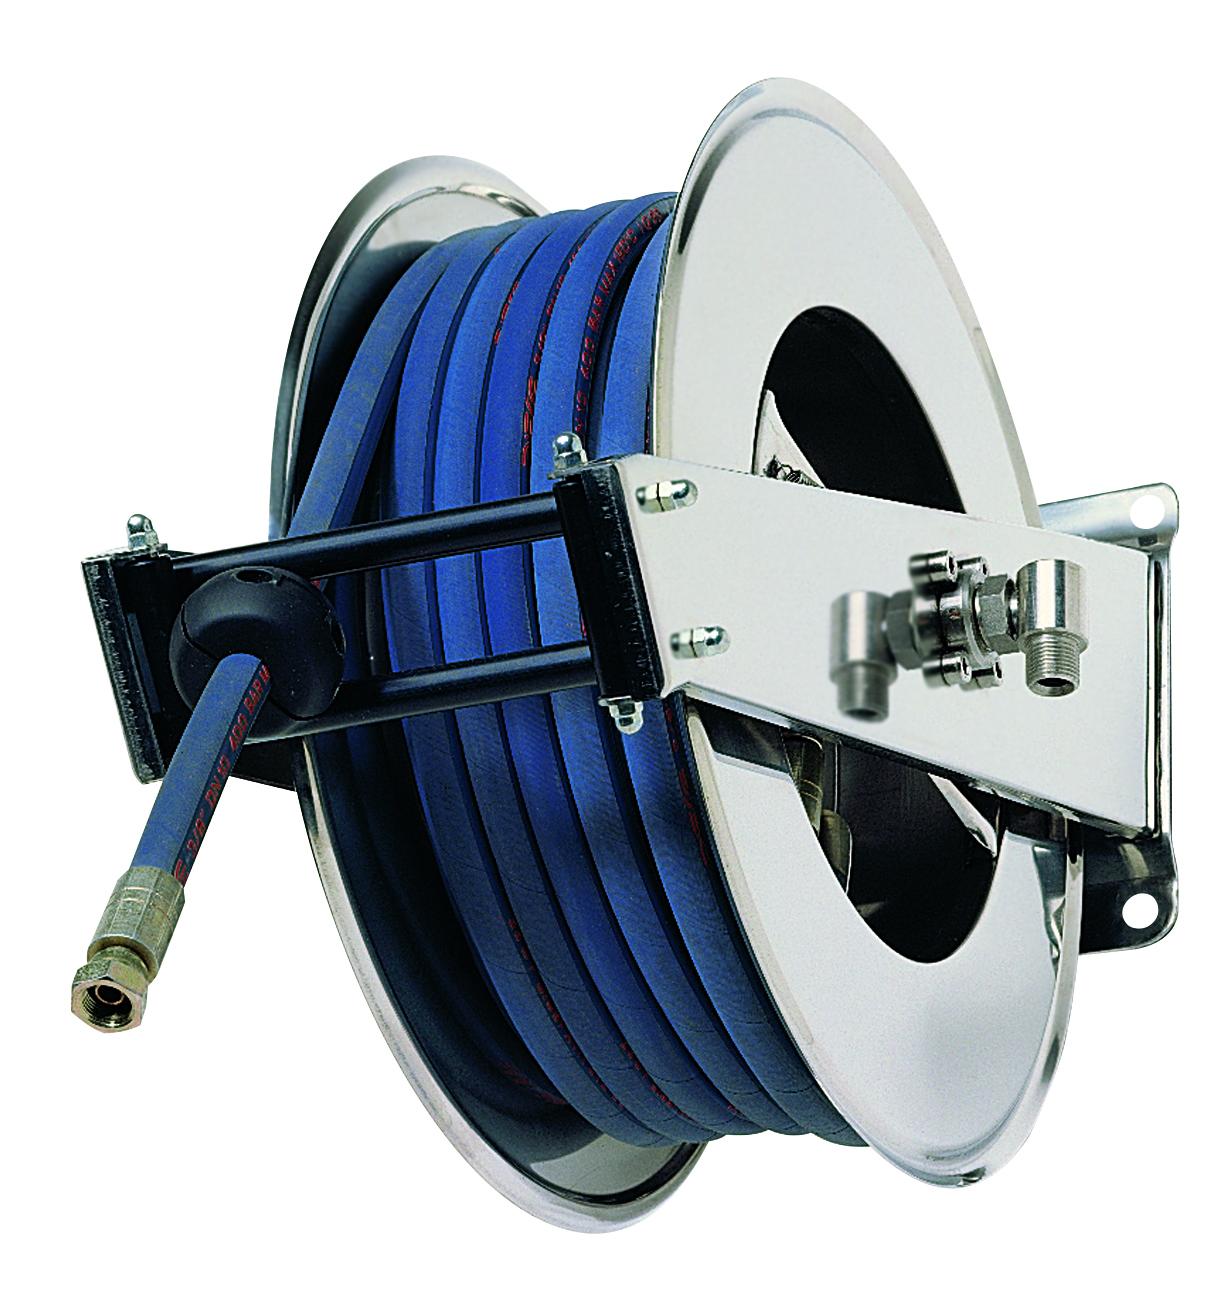 AV2000 - Hose reels per Acqua - Pressione Standard 0-200 BAR